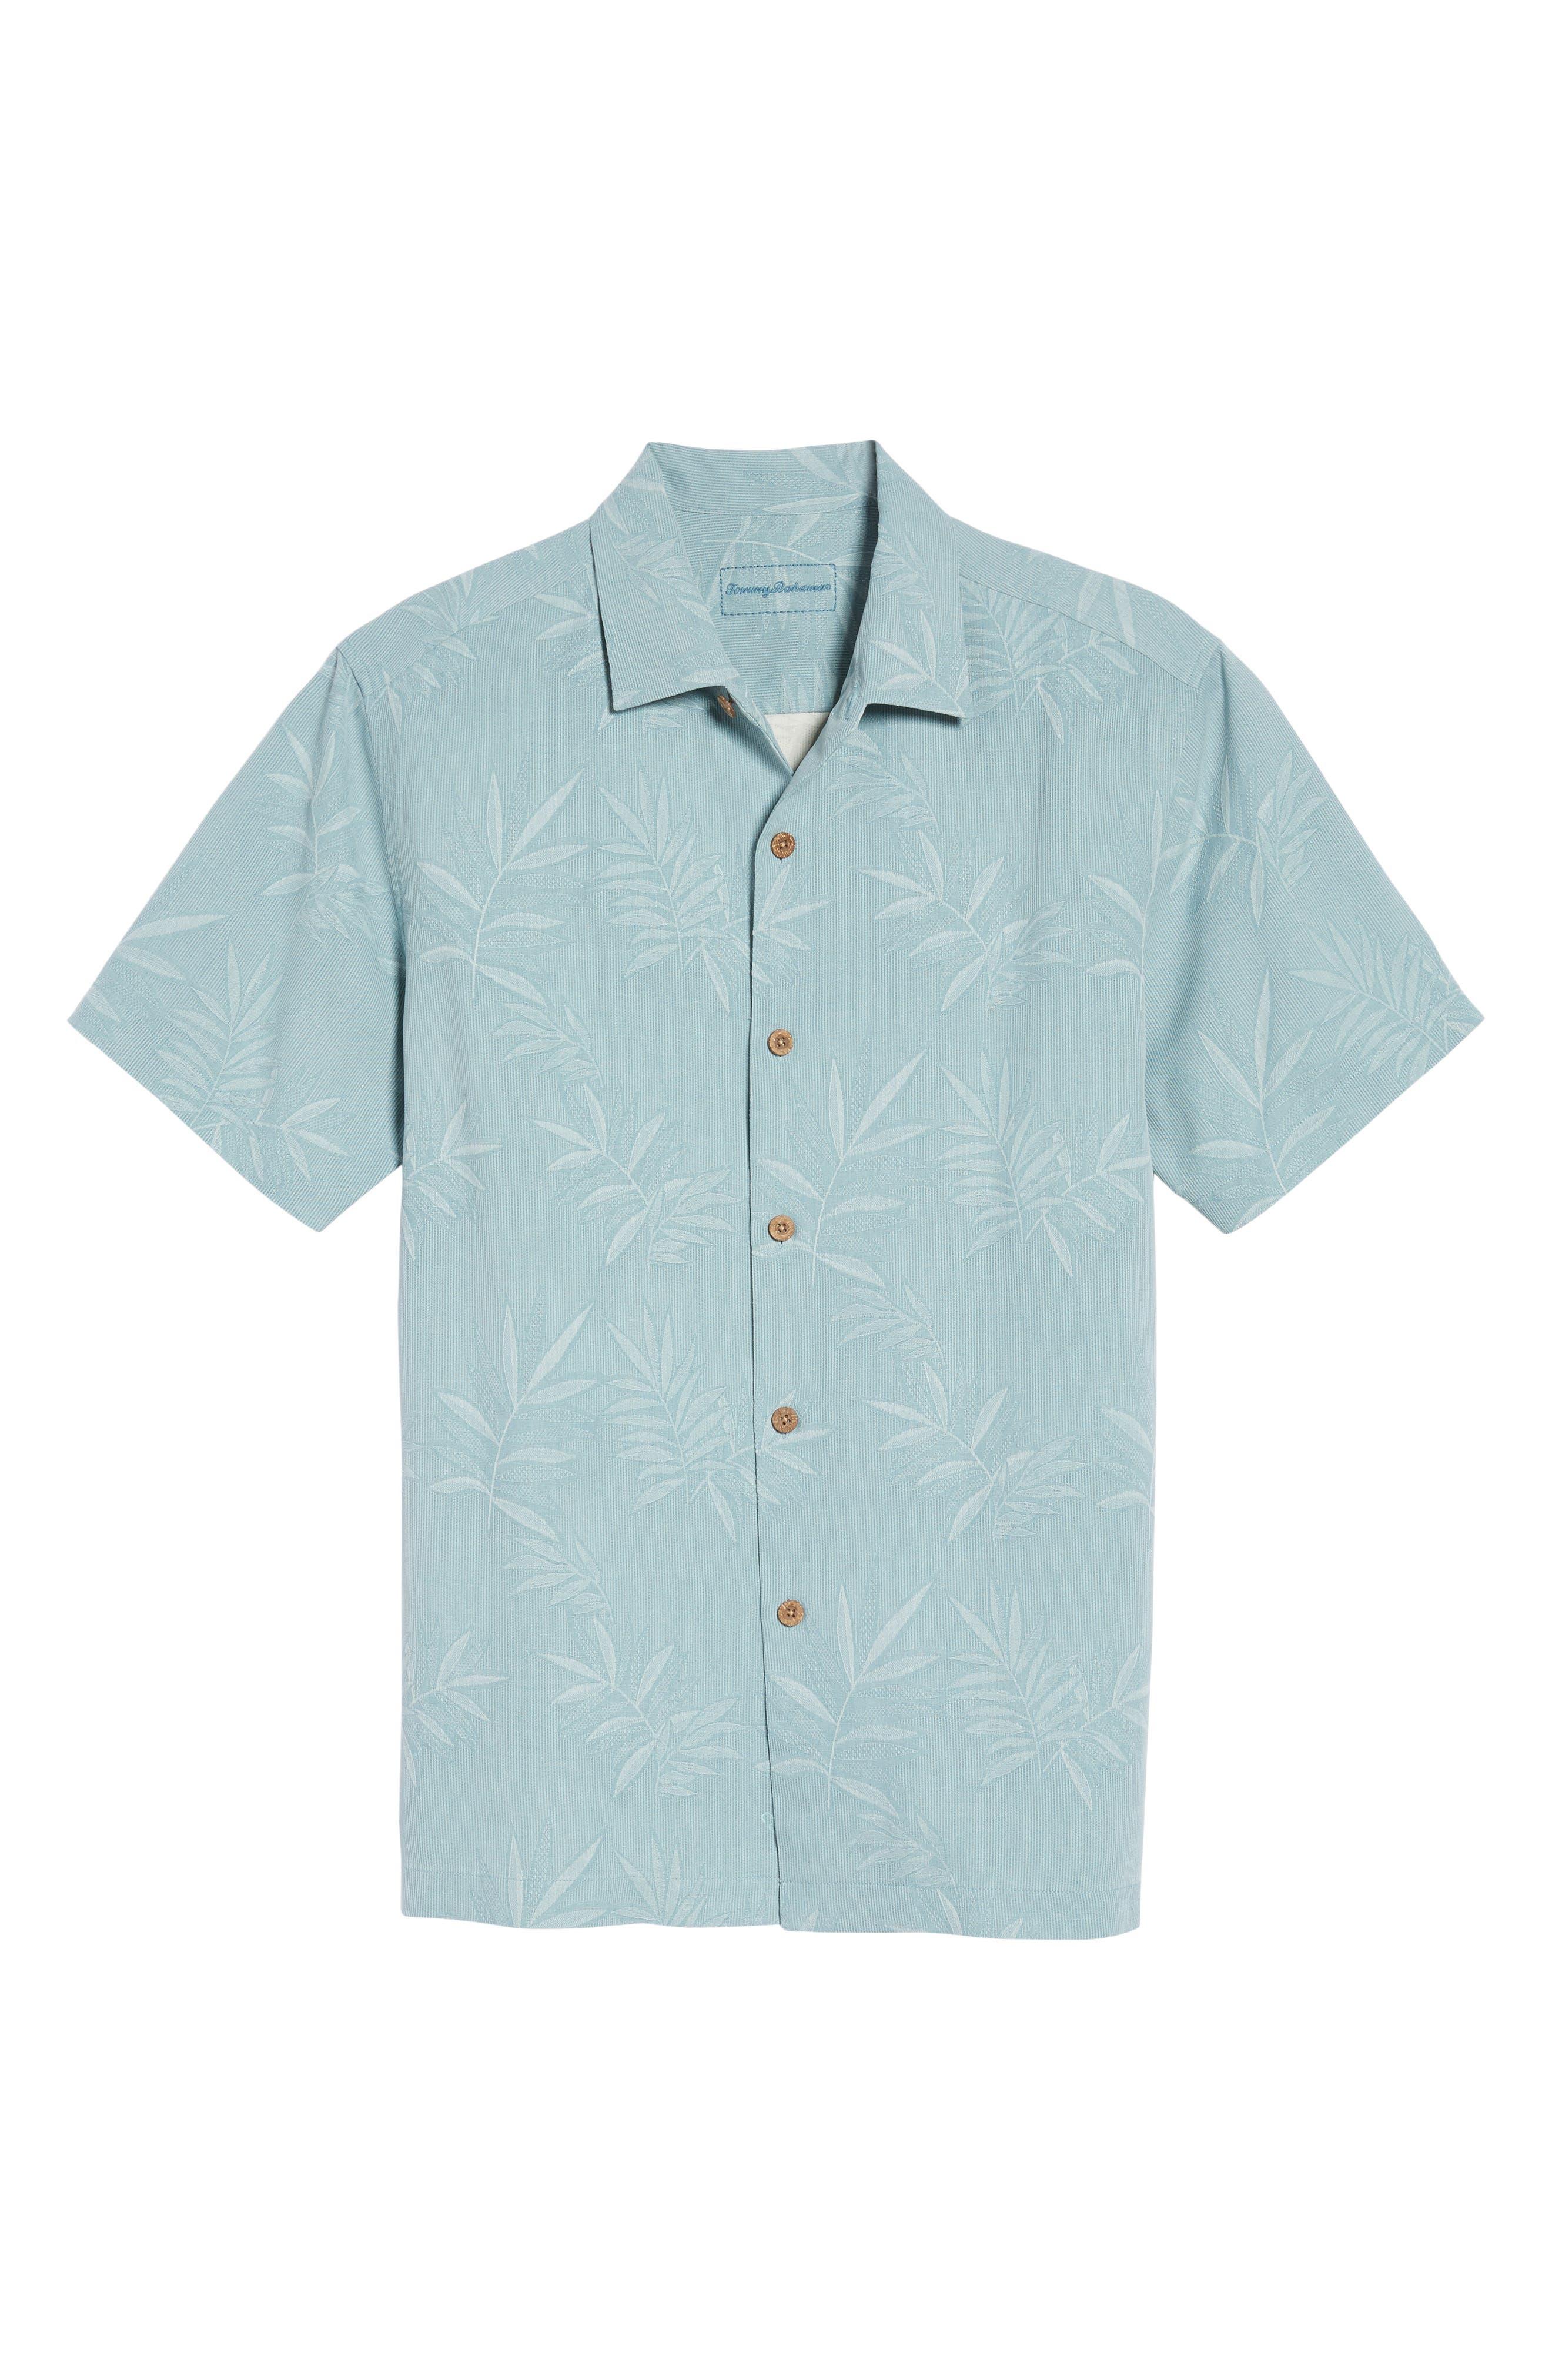 Luau Floral Silk Shirt,                             Alternate thumbnail 6, color,                             301